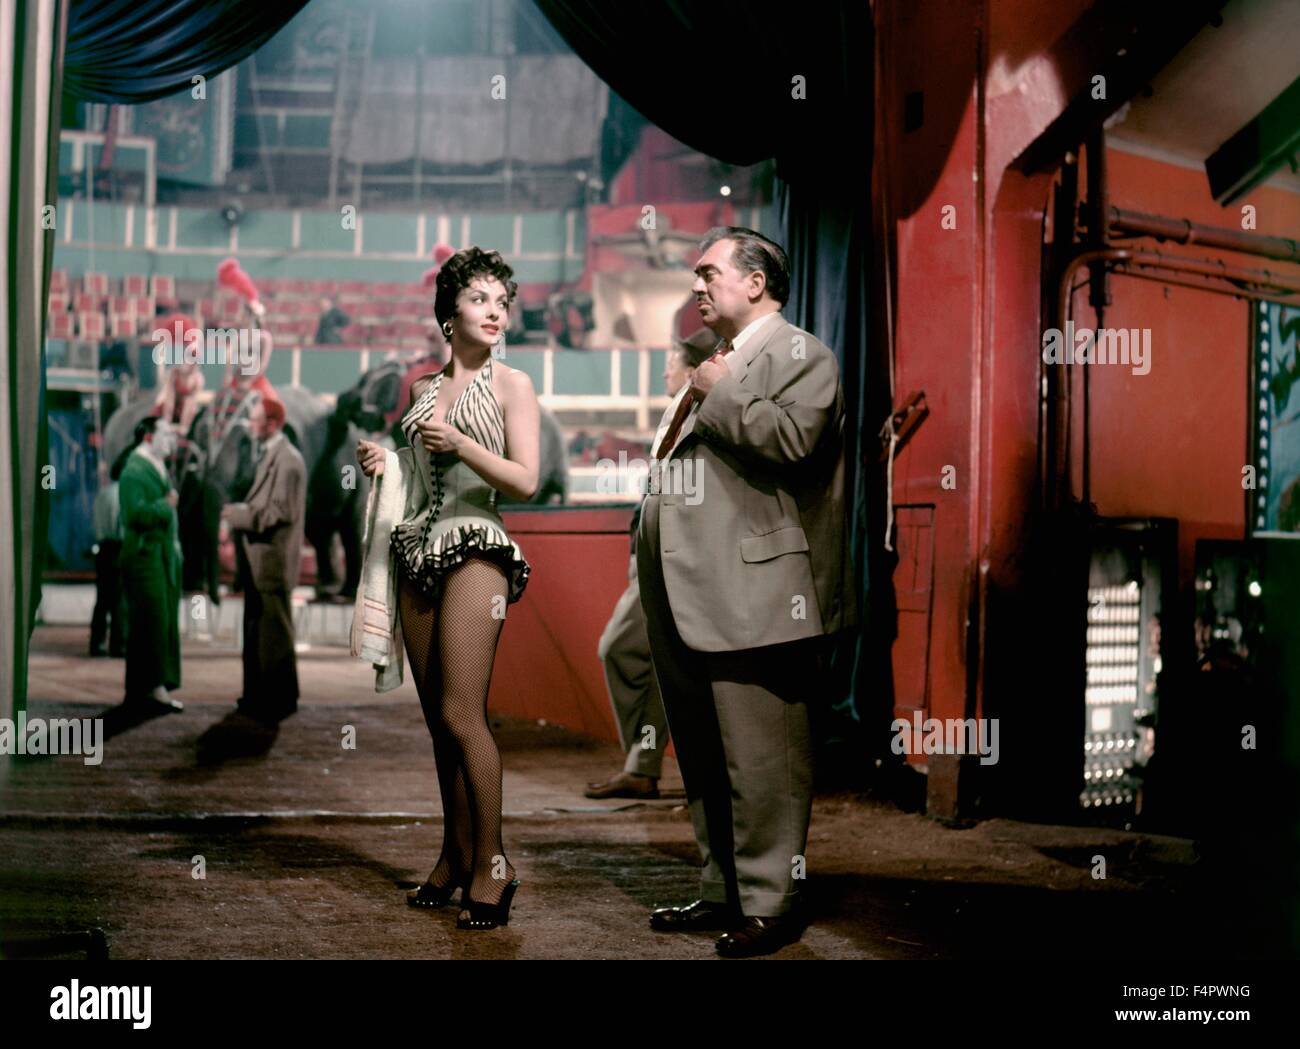 Gina Lollobrigida and Thomas Gomez / Trapeze / 1956 directed by Carol Reed [United Artists] - Stock Image